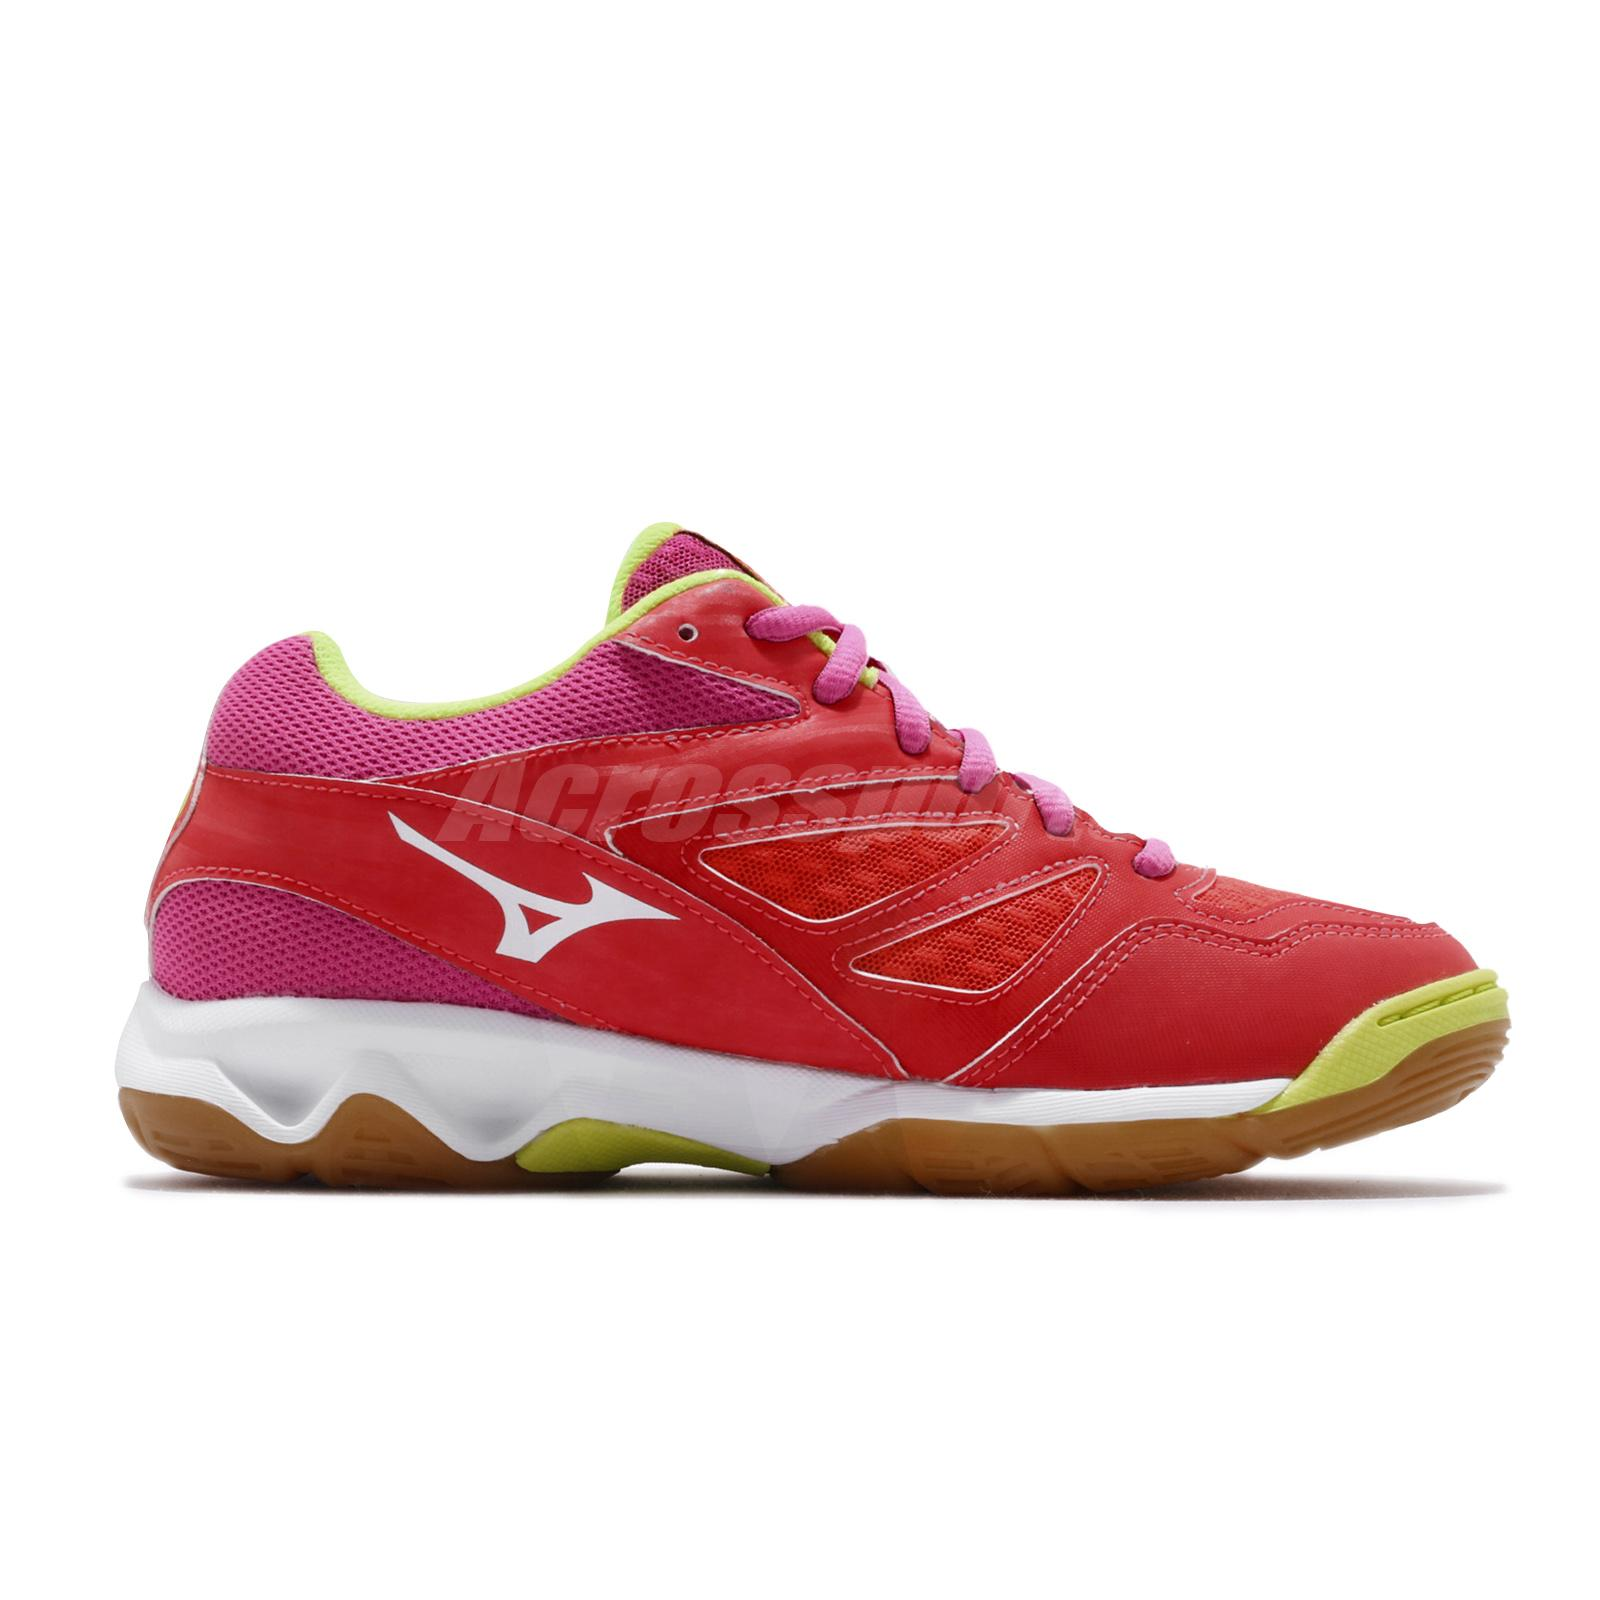 mizuno womens volleyball shoes size 8 x 2 internacional news